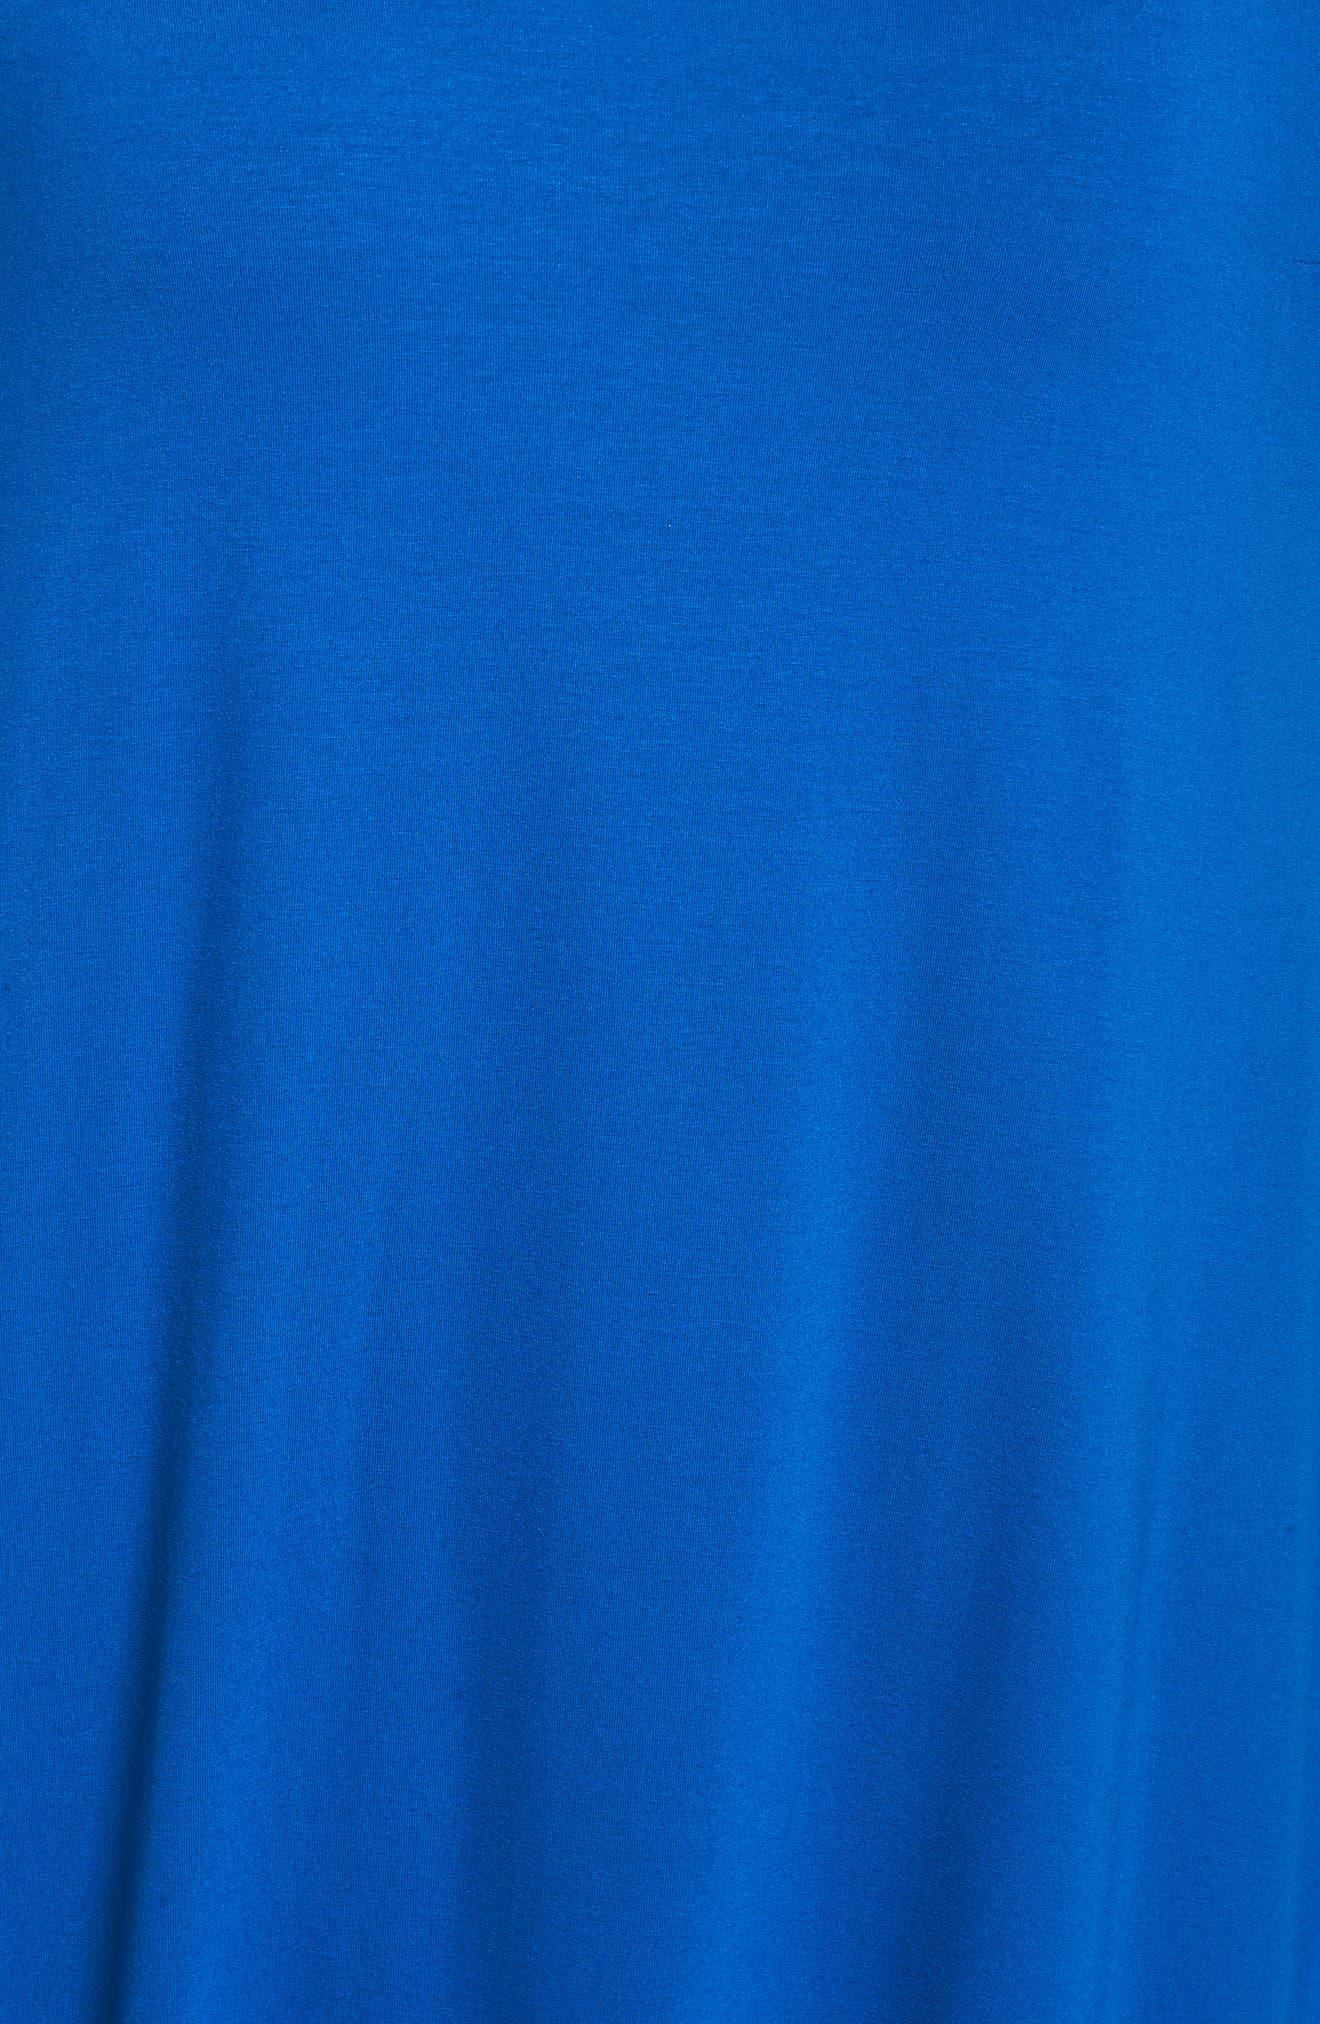 Jersey Tunic Dress,                             Alternate thumbnail 18, color,